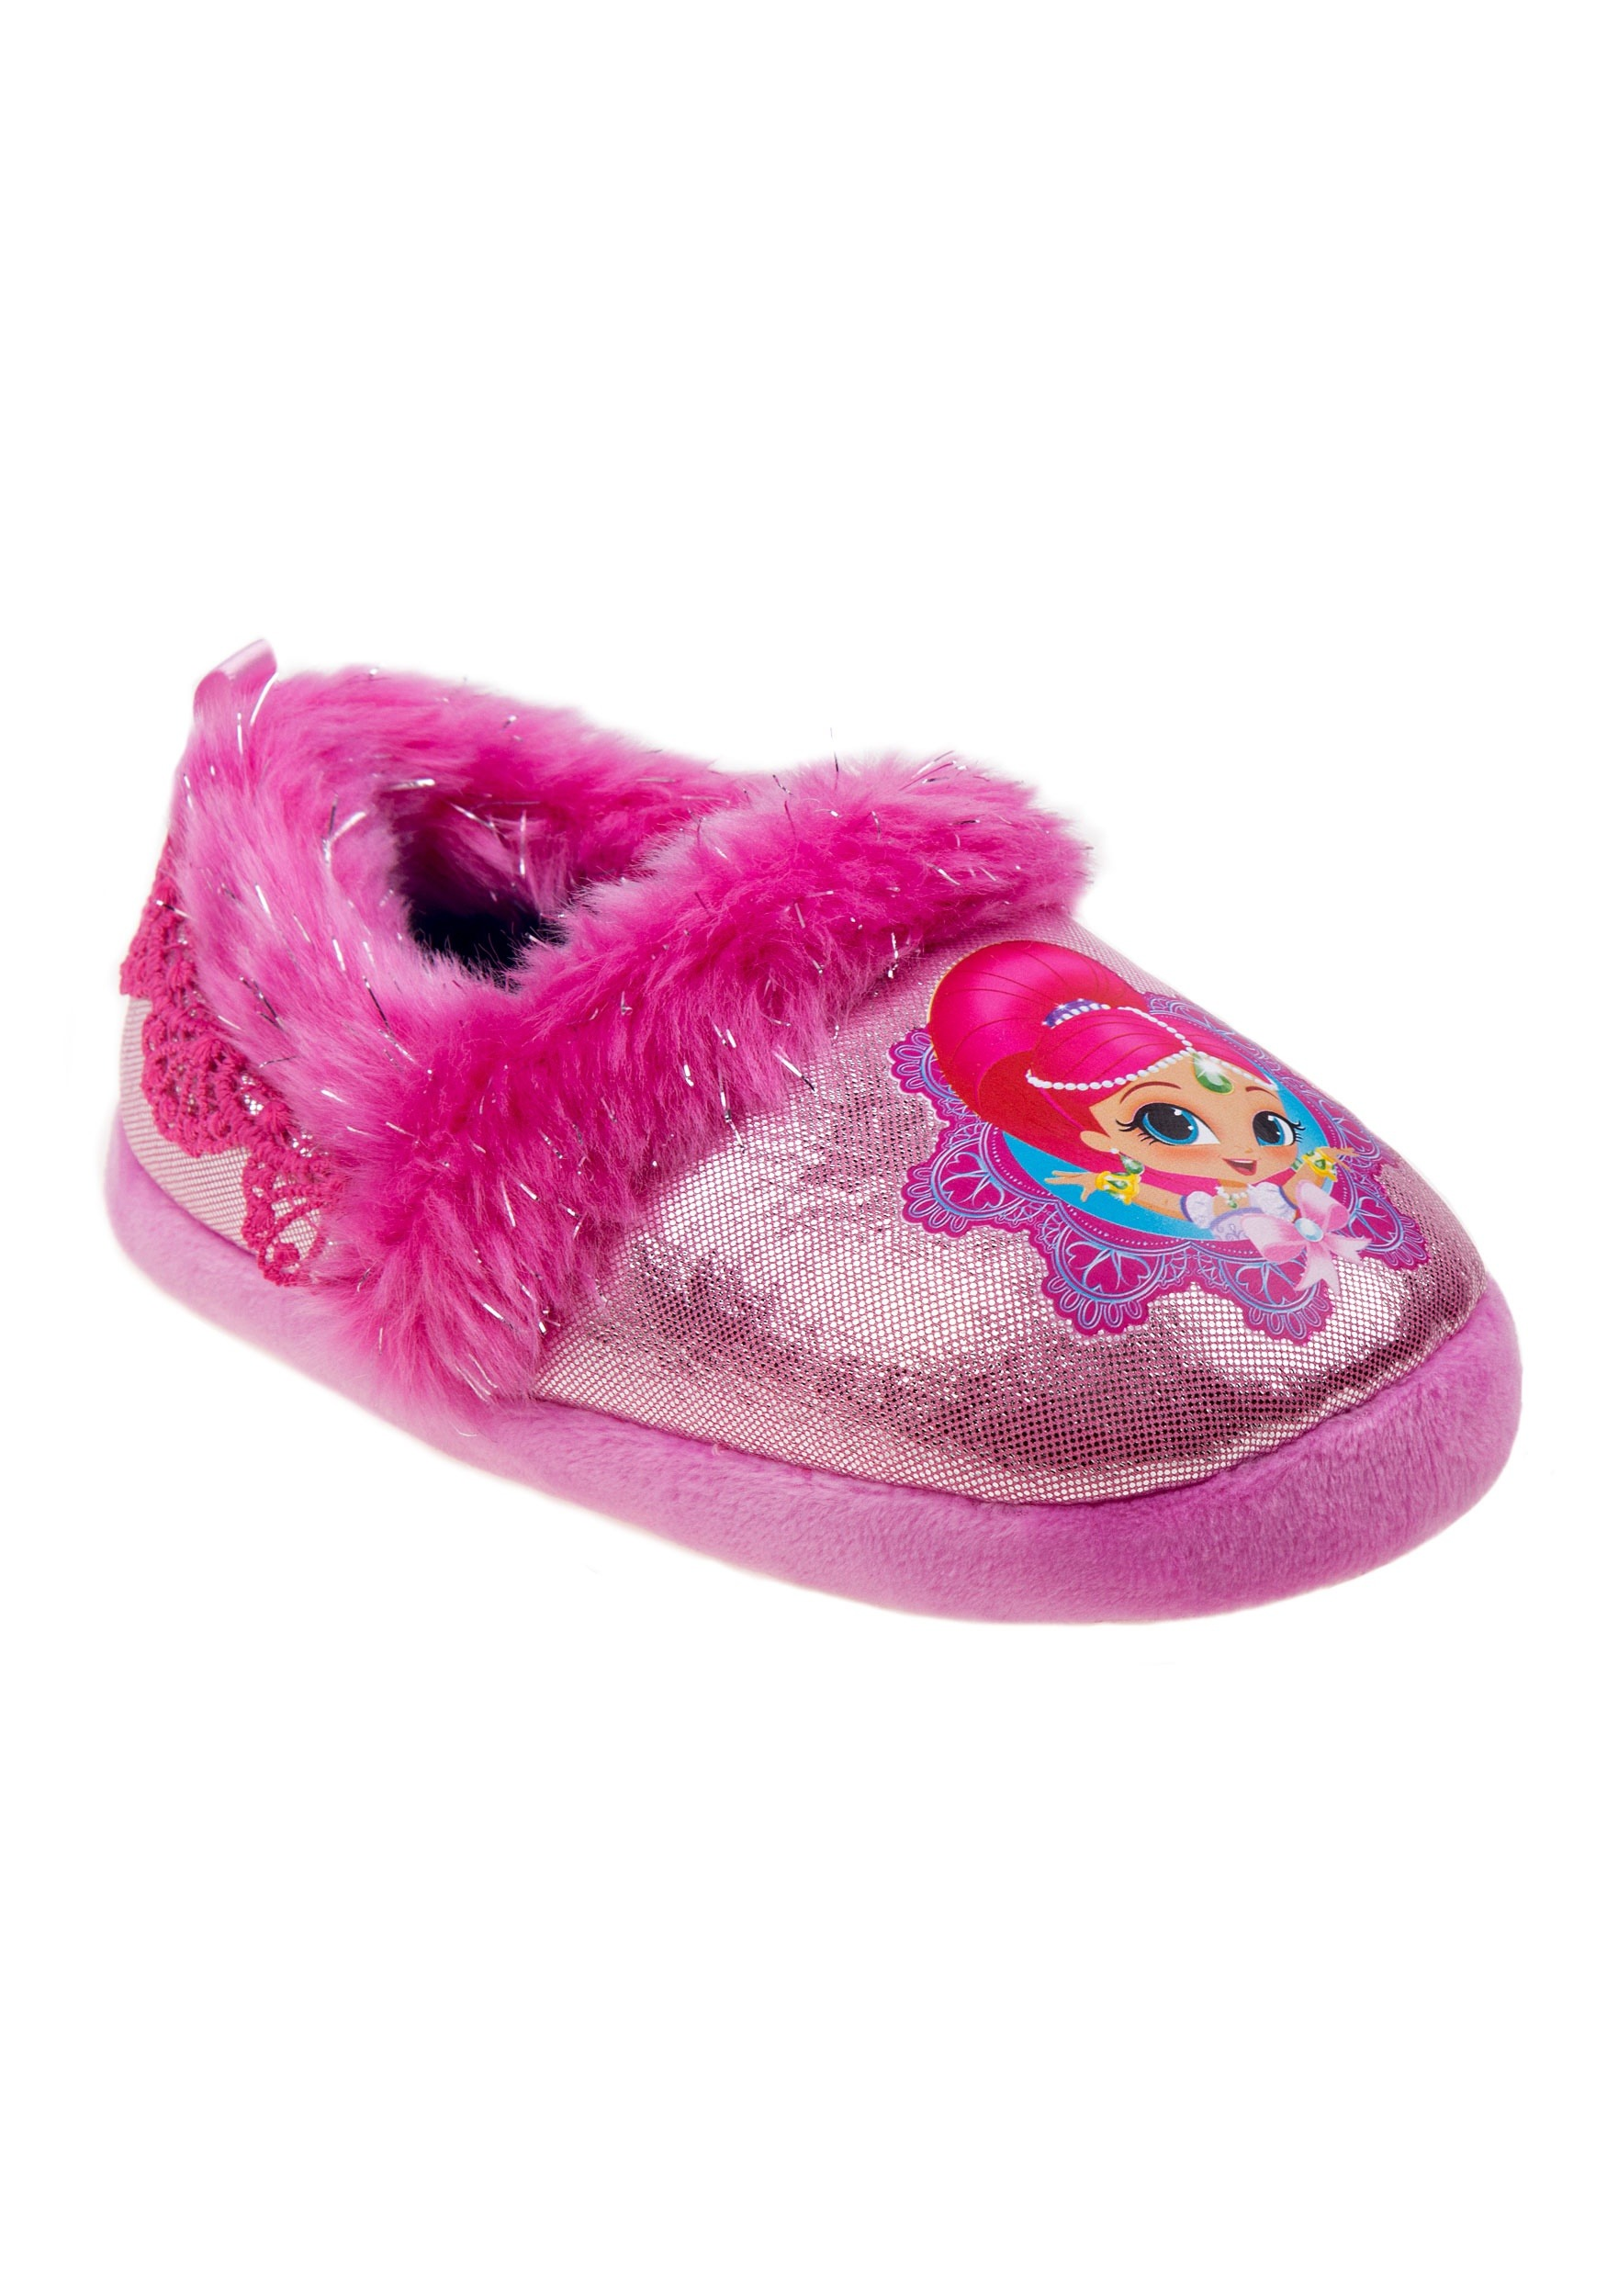 Nickelodeon Shimmer & Shine Kids Slippers